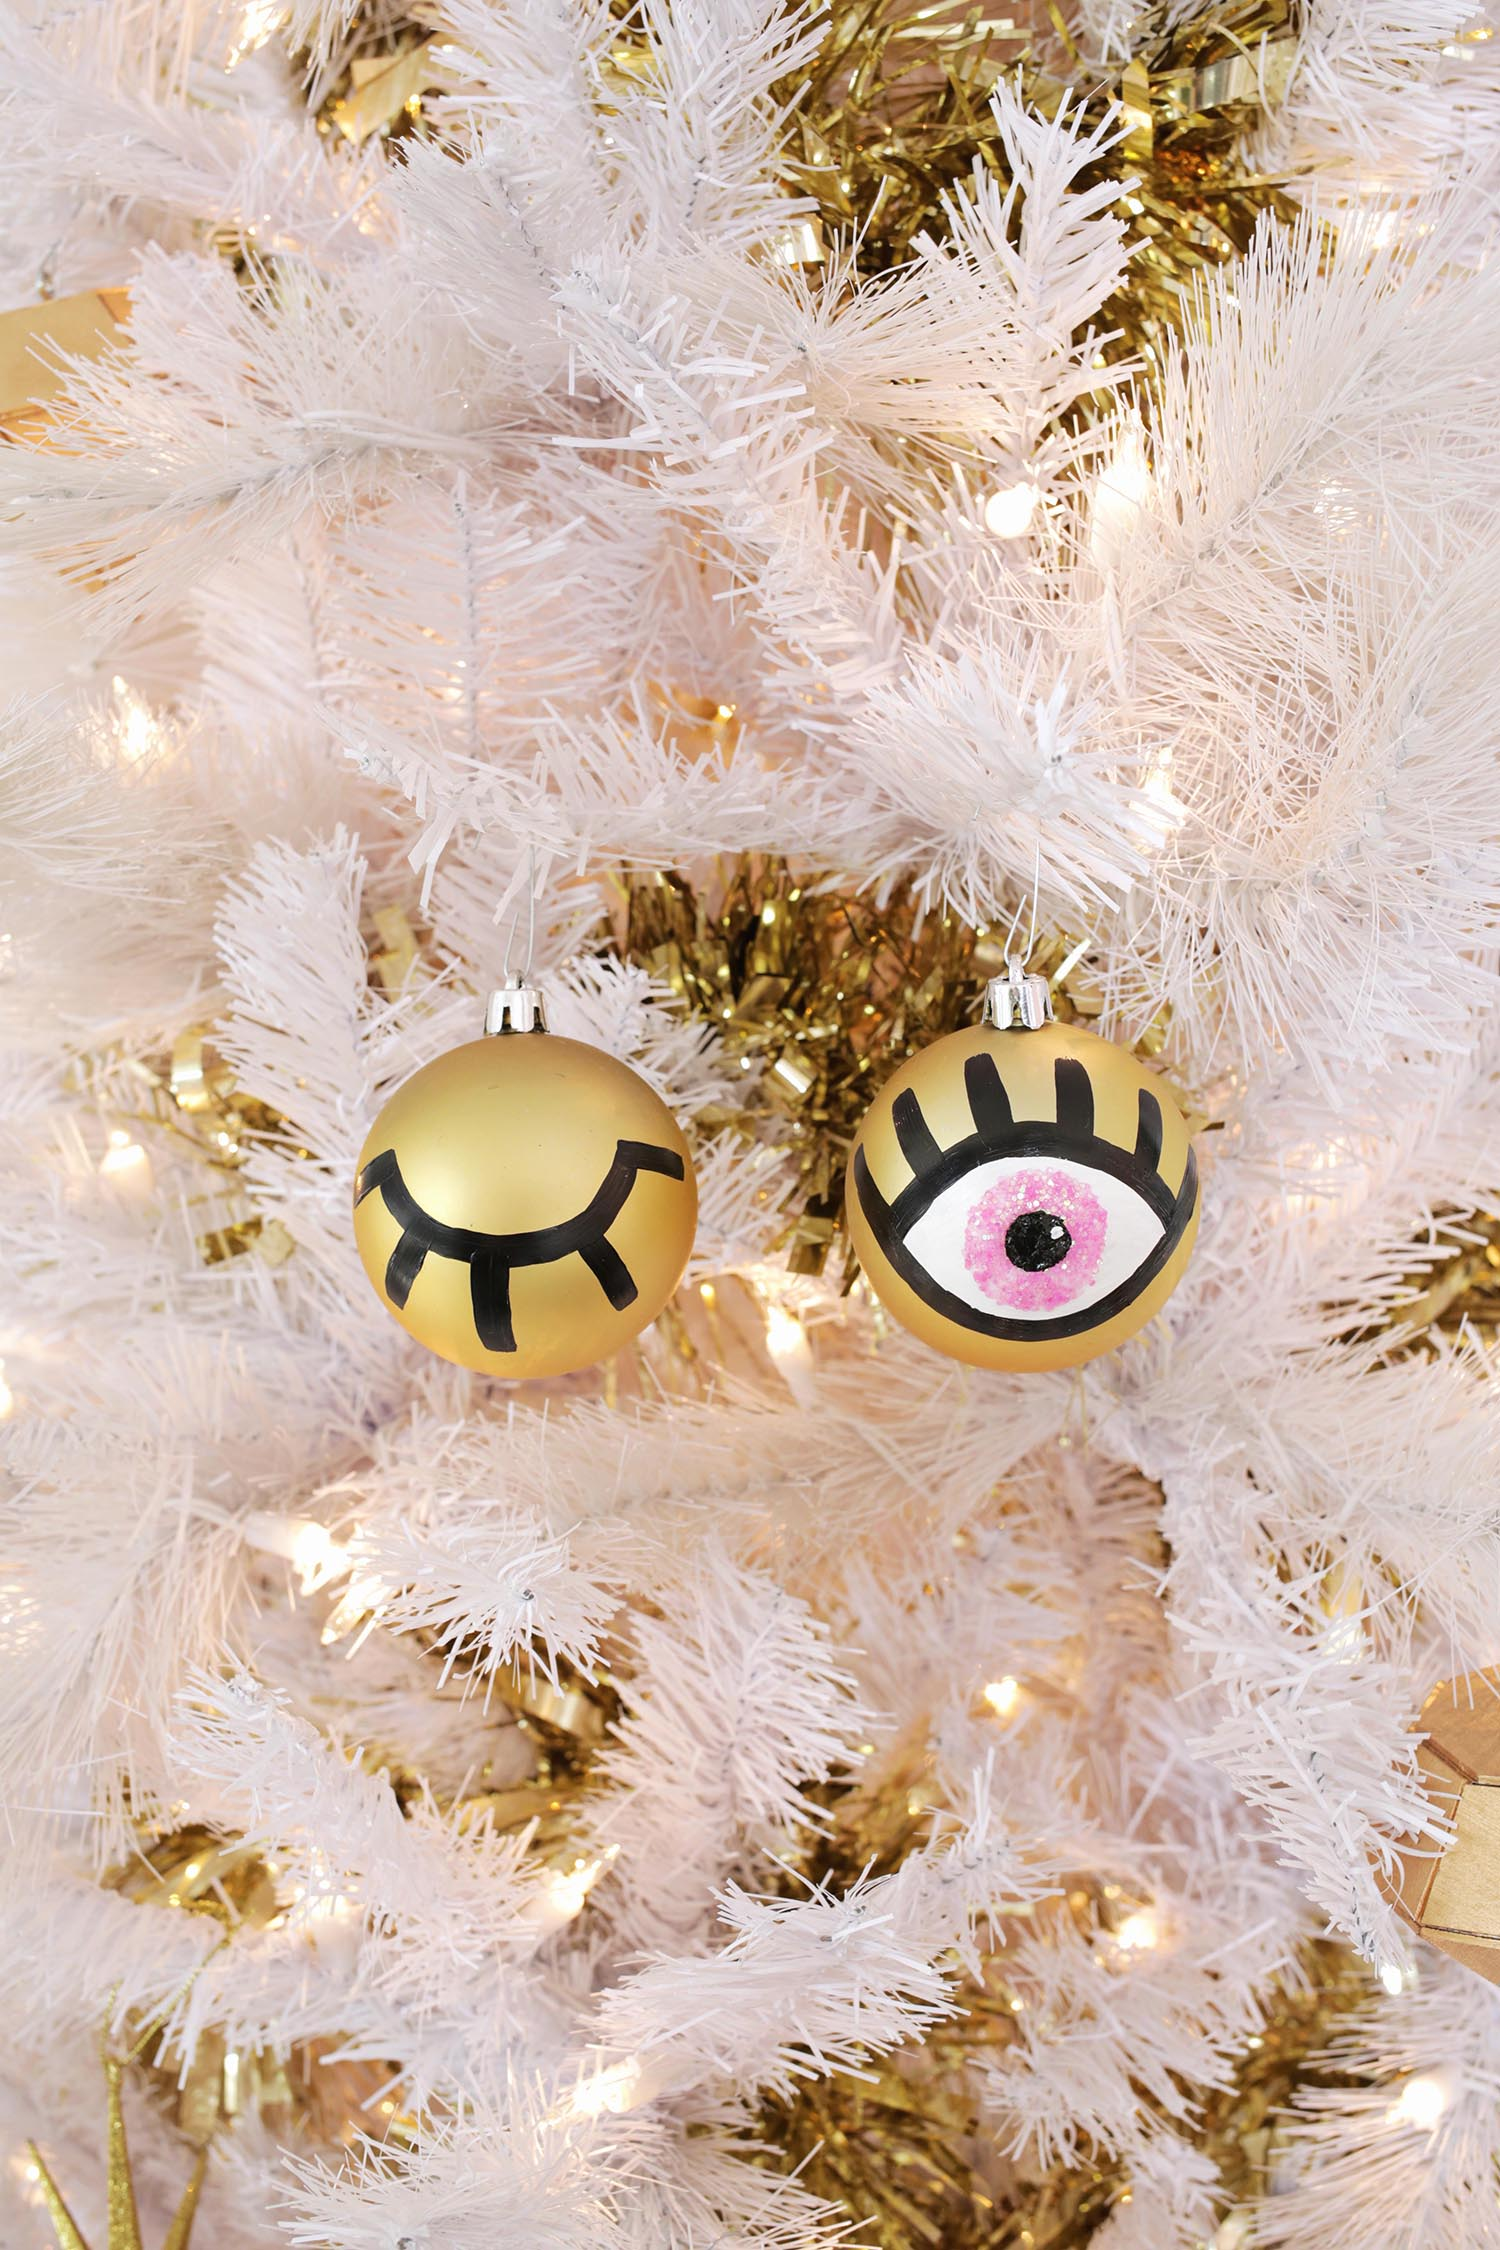 AGH! So cute! Eye ornament DIY (click through for tutorial)